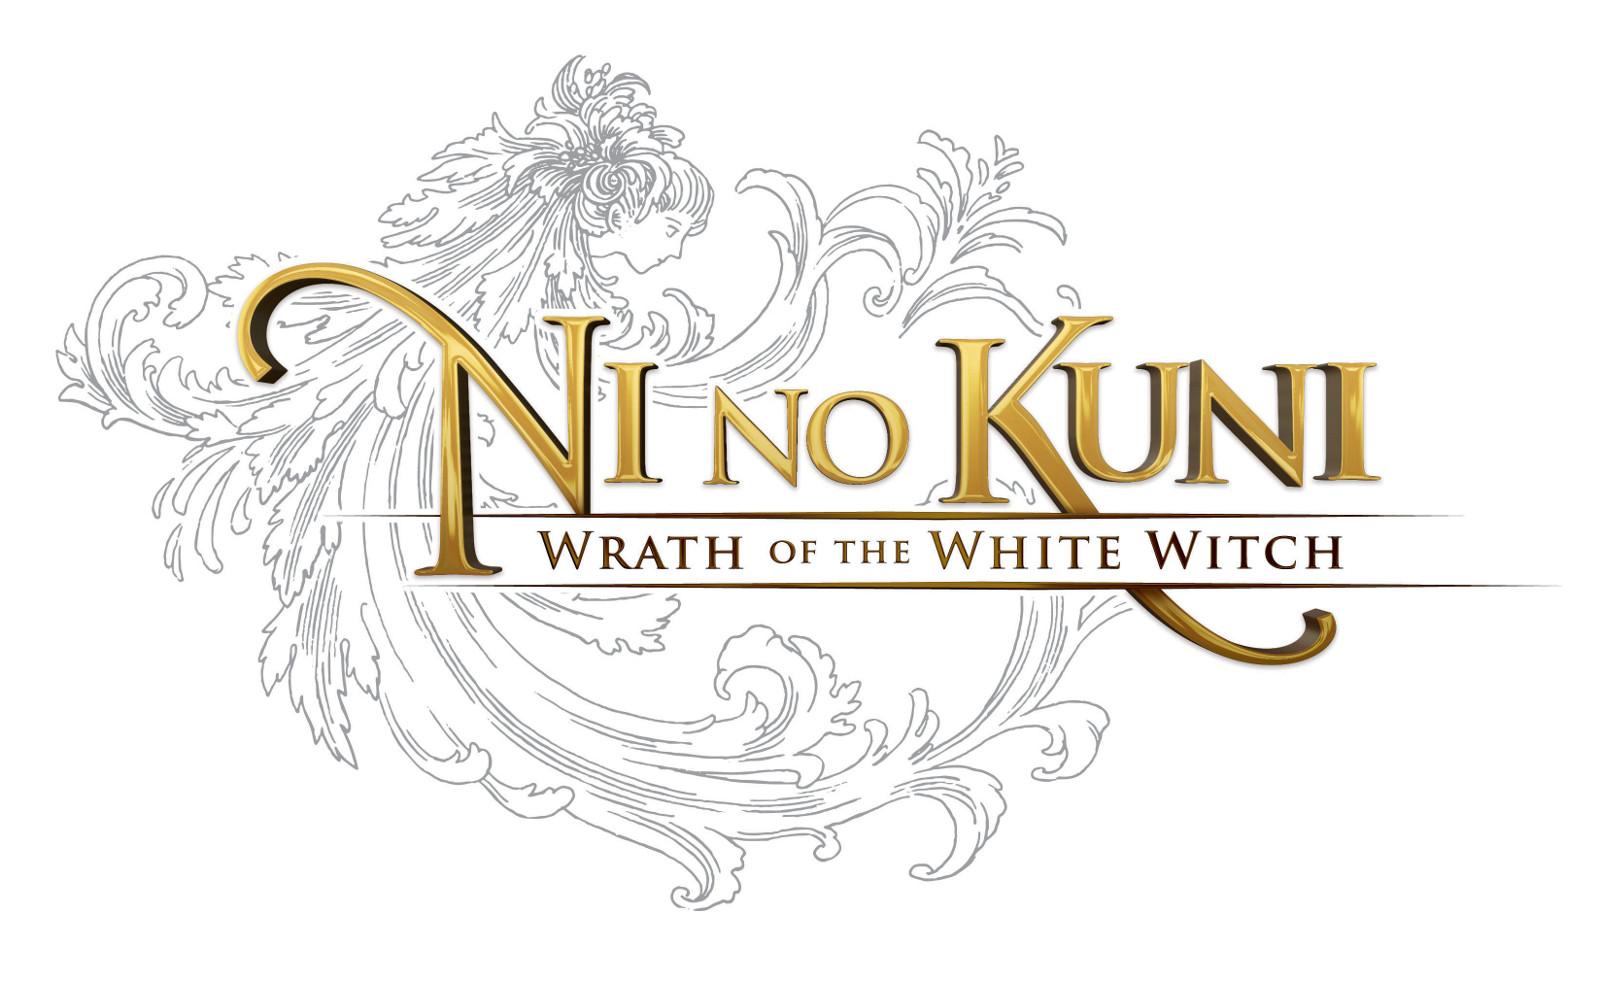 http://www.theaveragegamer.com/wp-content/uploads/2013/01/Ni-No-Kuni-Logo.jpg